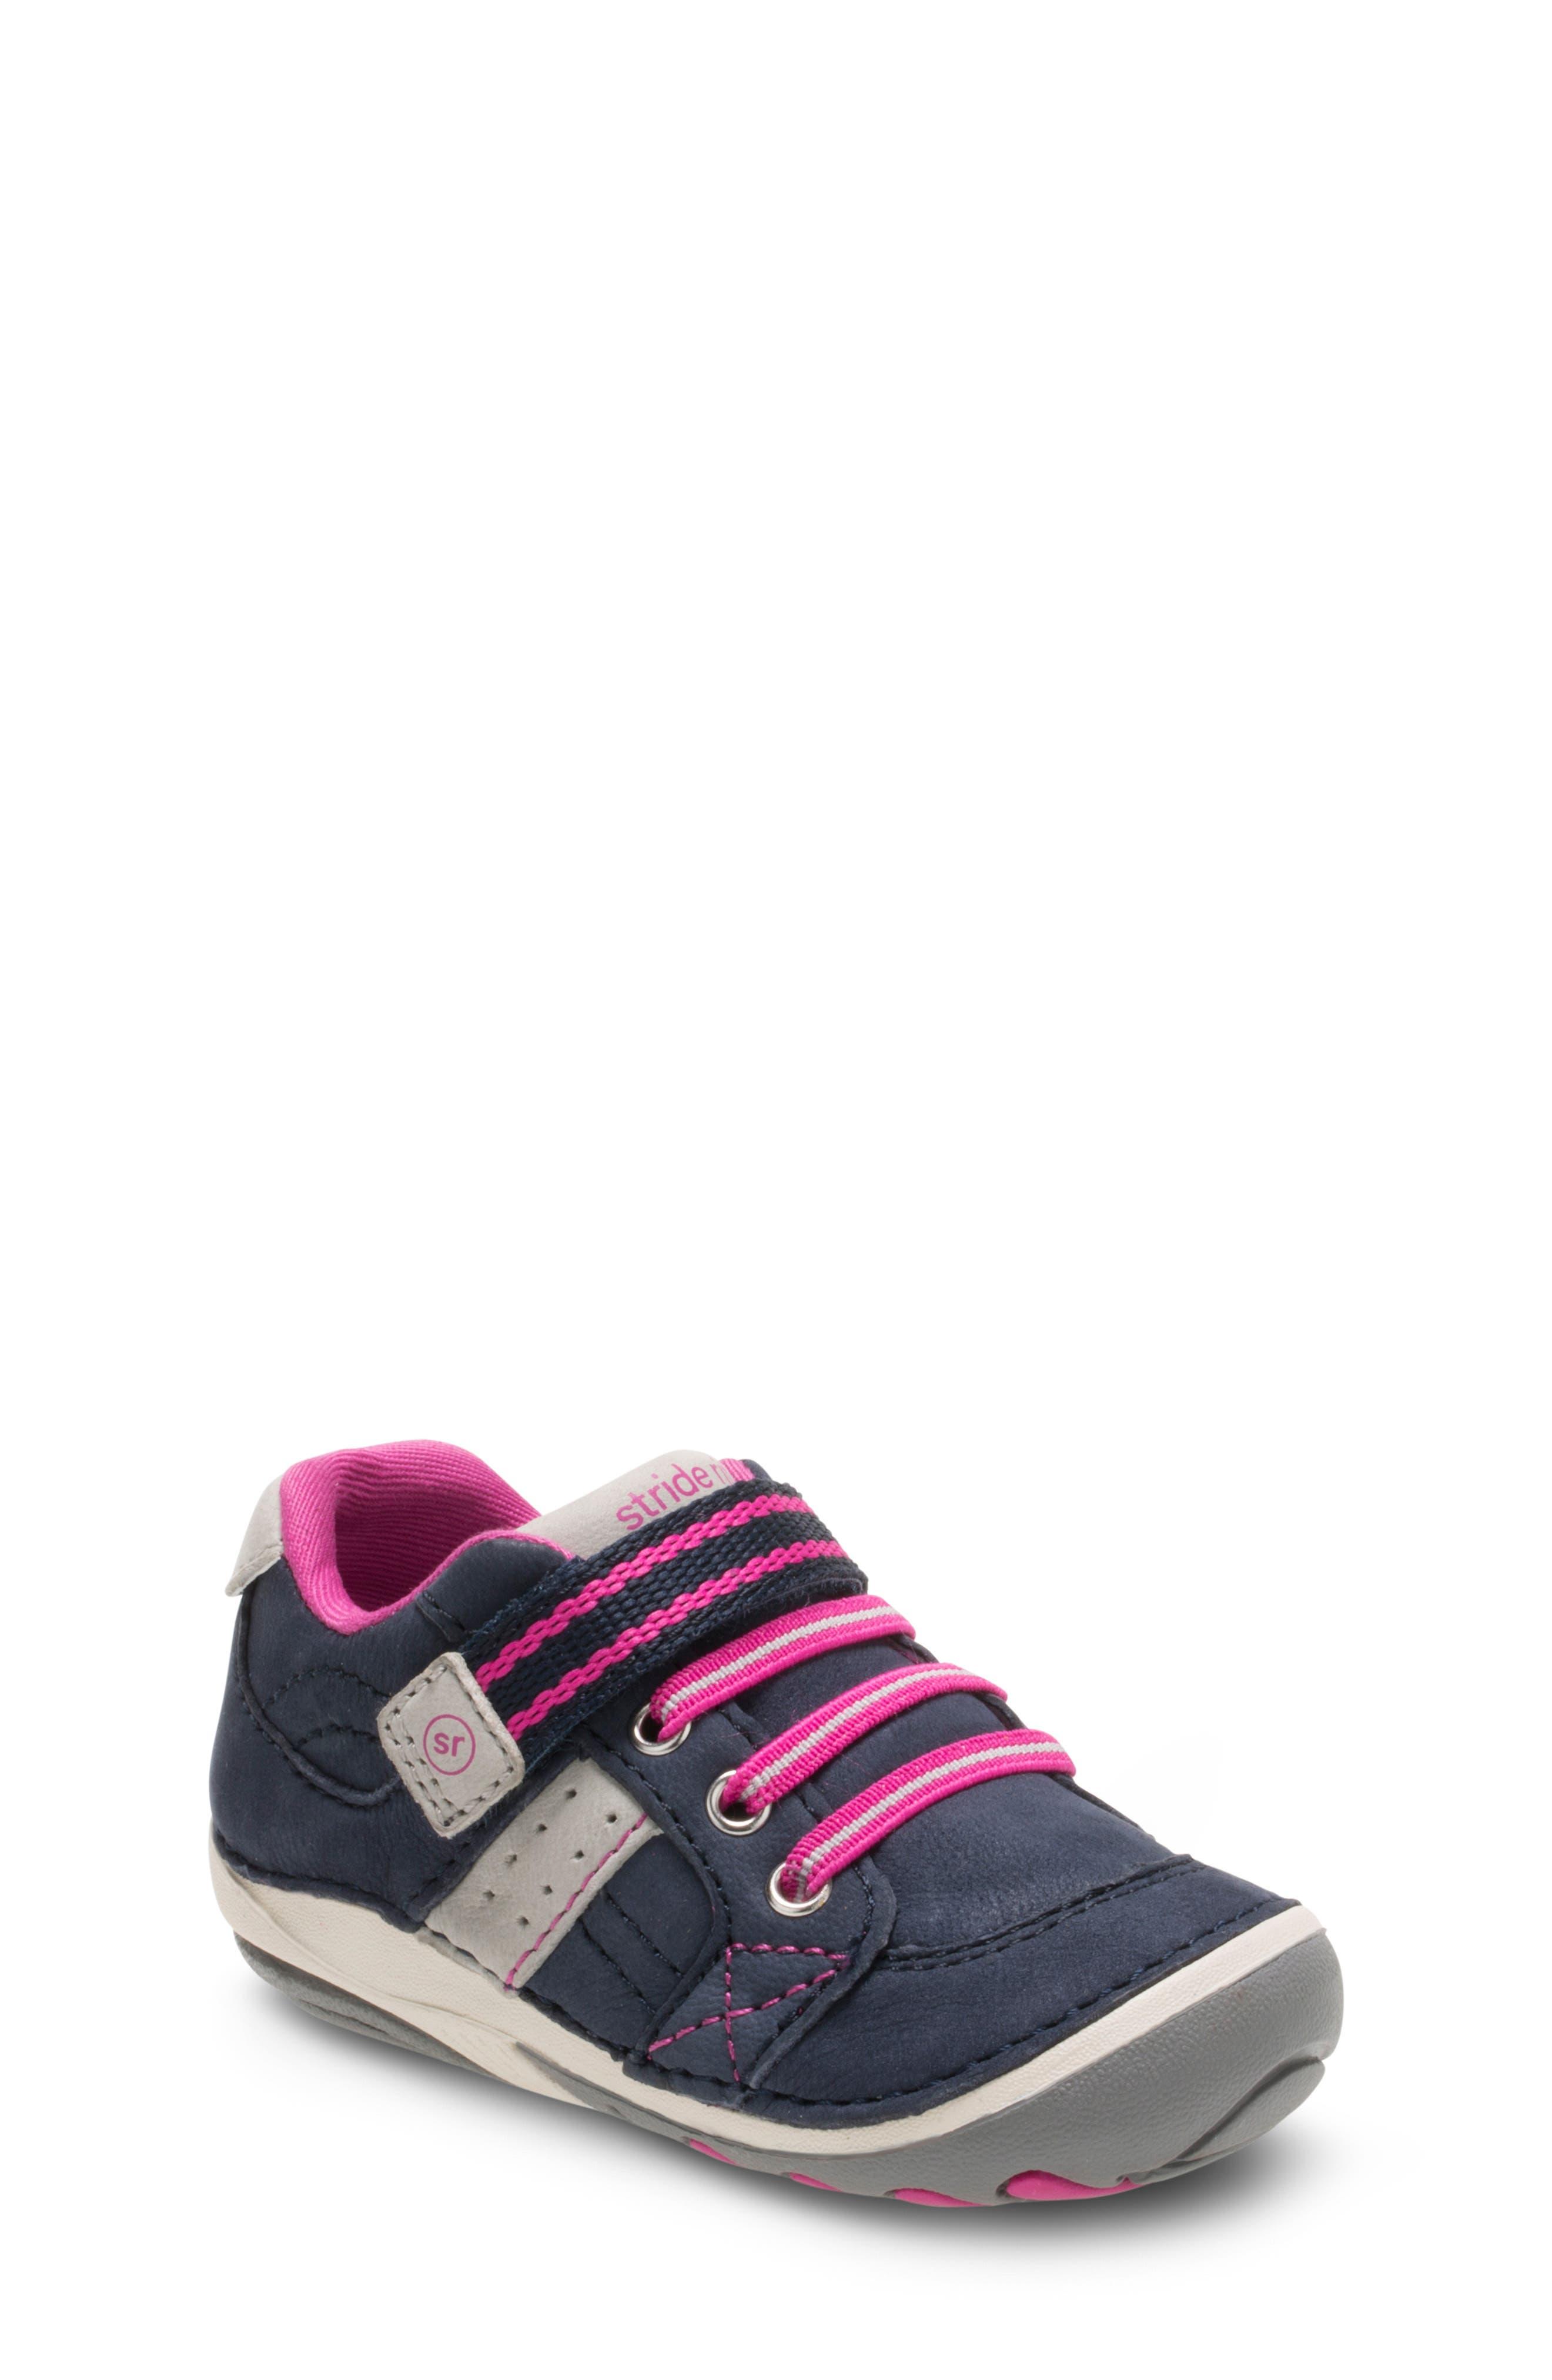 'Artie' Sneaker,                             Main thumbnail 1, color,                             NAVY/ PINK